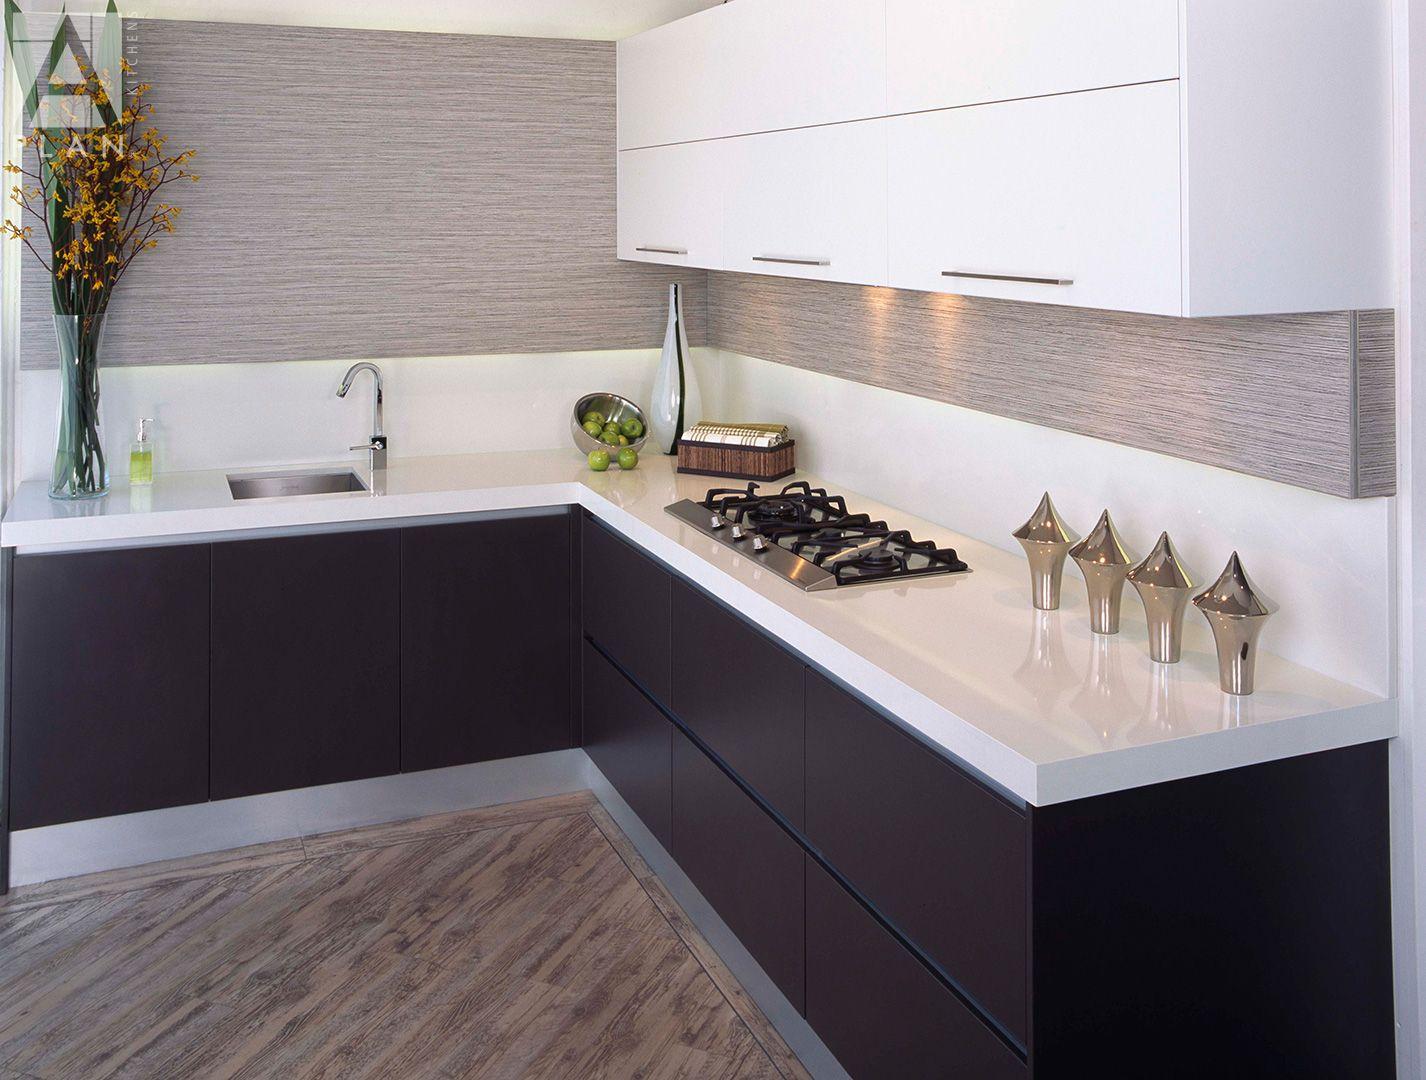 laminex kitchen design. laminex espresso on base cabinets  Renovations Pinterest Base